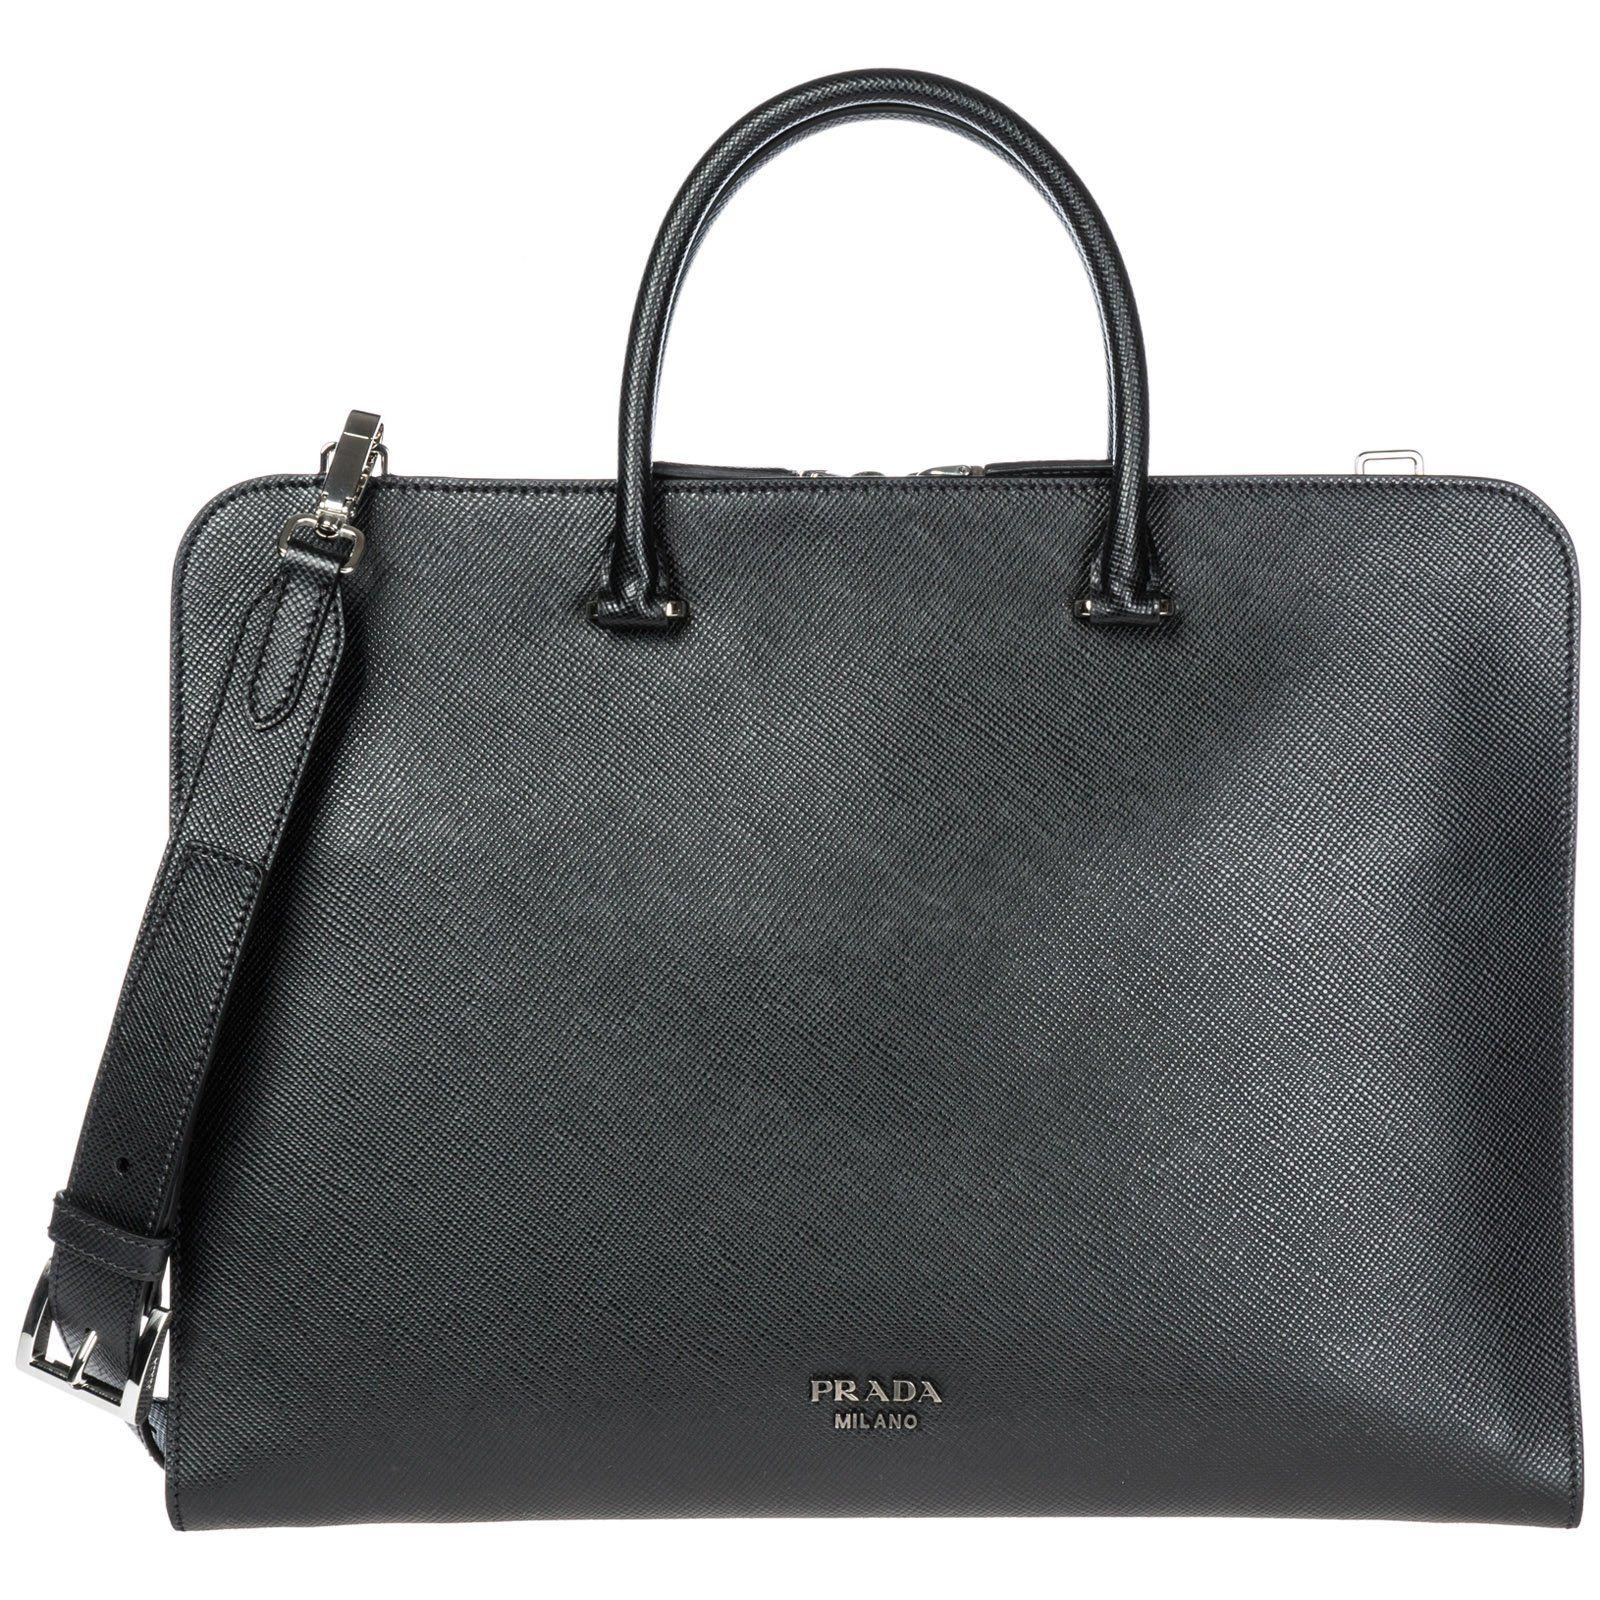 828dfafe89 PRADA PRADA LOGO LAPTOP BAG.  prada  bags  shoulder bags  hand bags ...